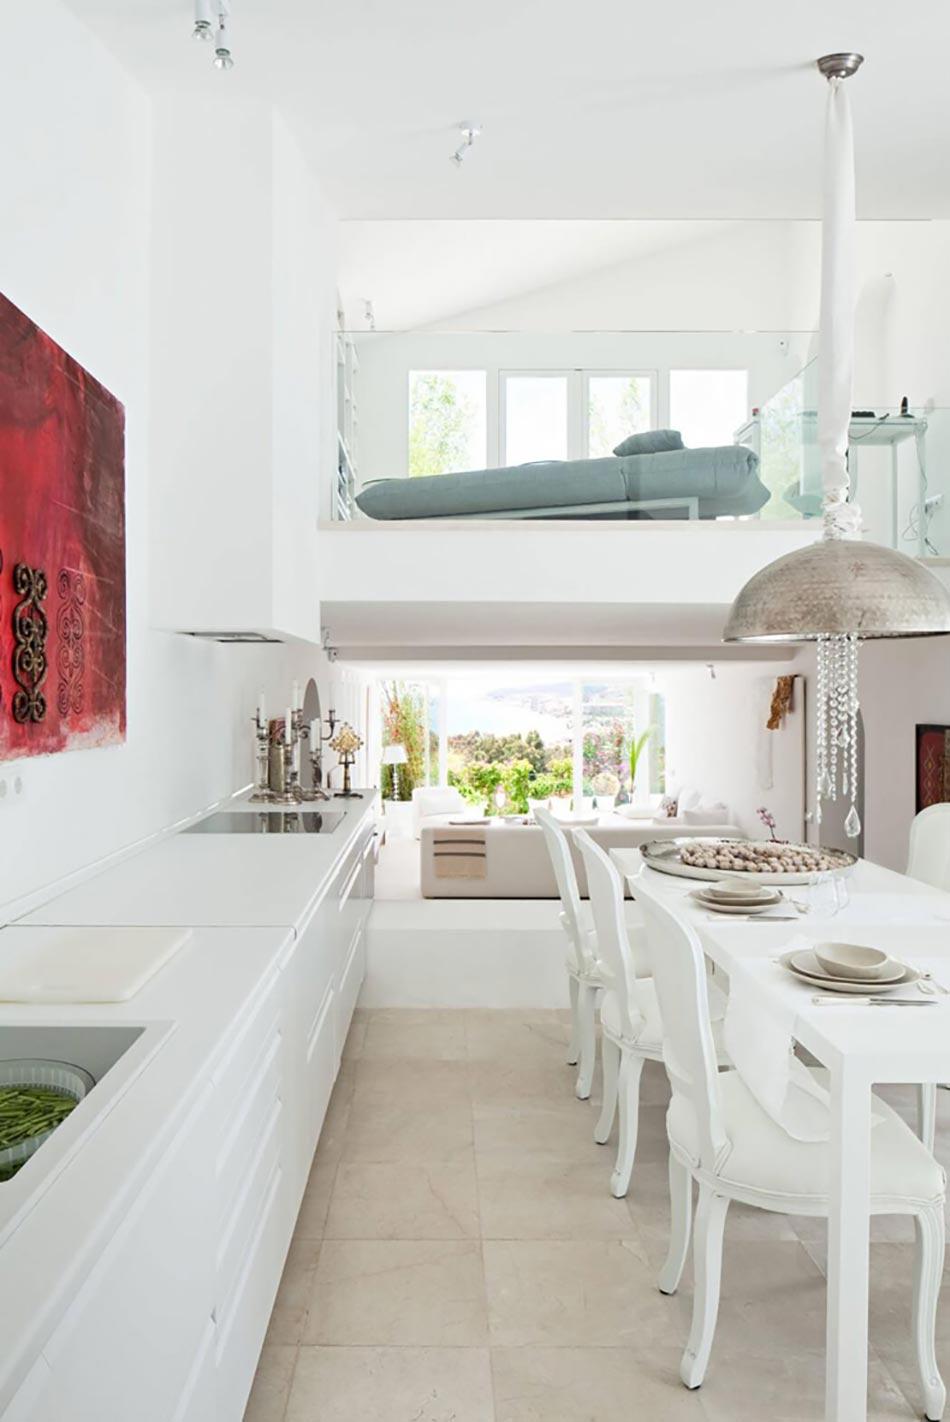 magnifique villa de luxe sur la c te espagnole design feria. Black Bedroom Furniture Sets. Home Design Ideas